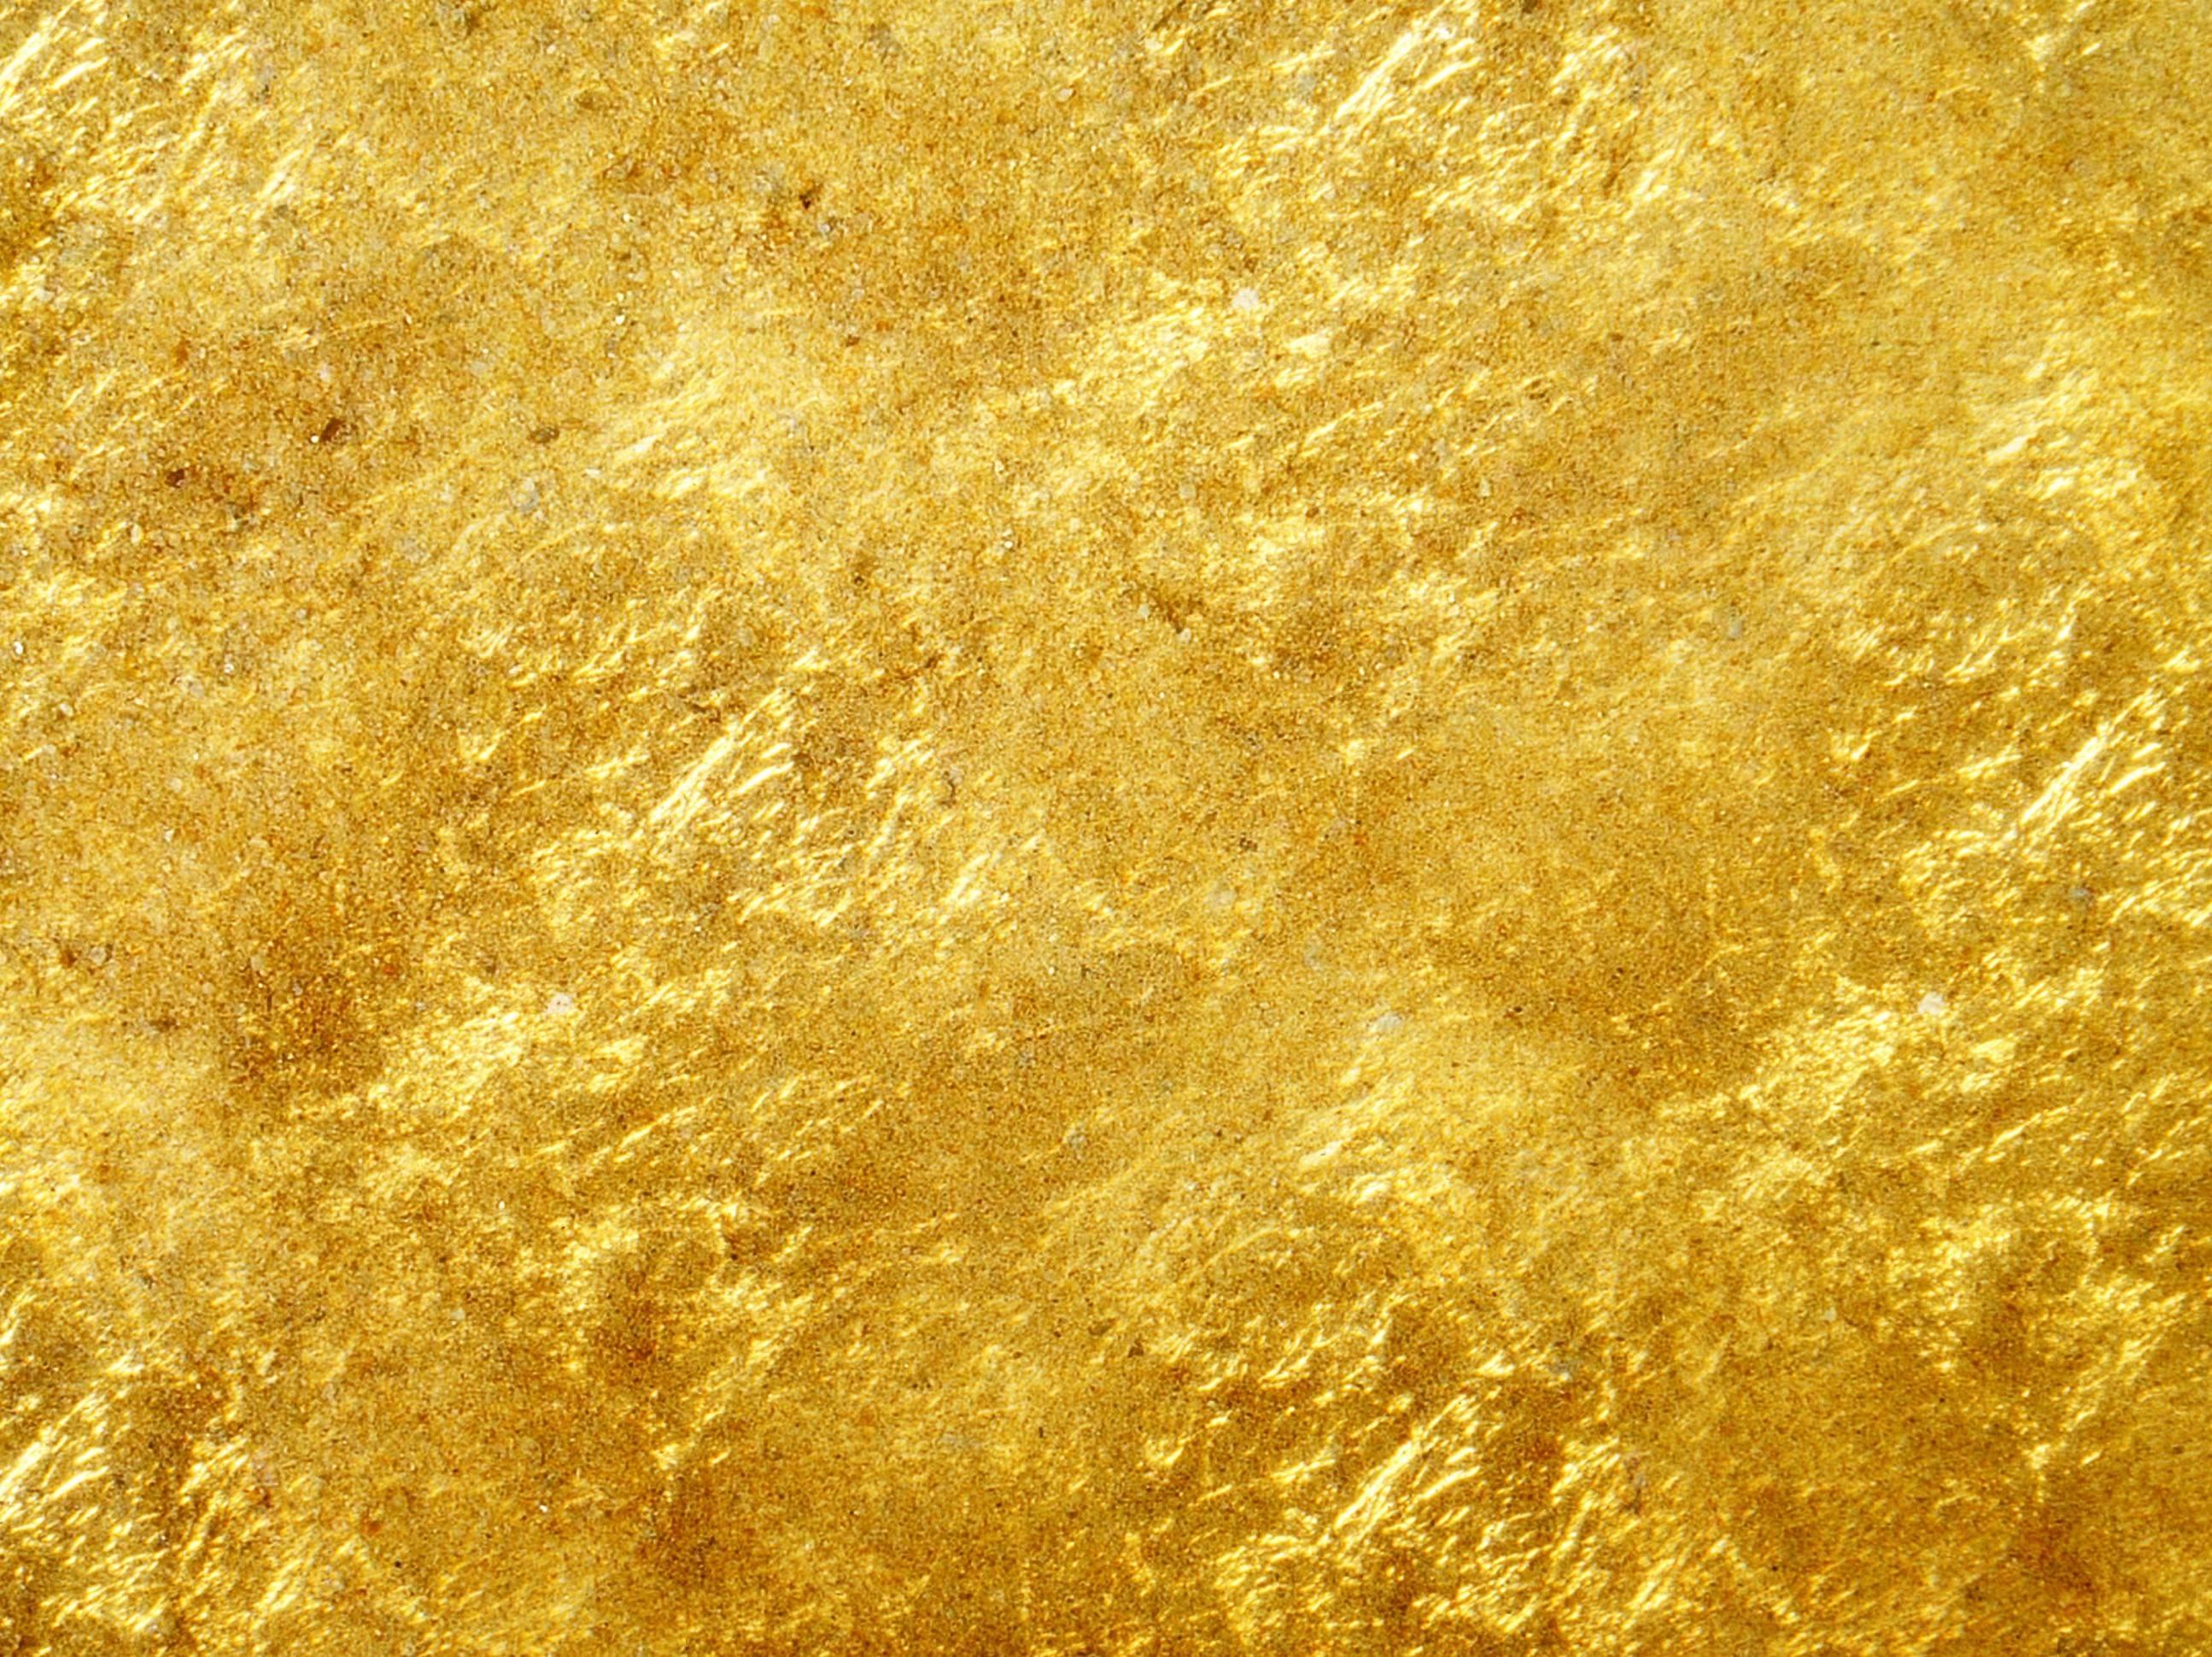 golden gold texture background MEMEs